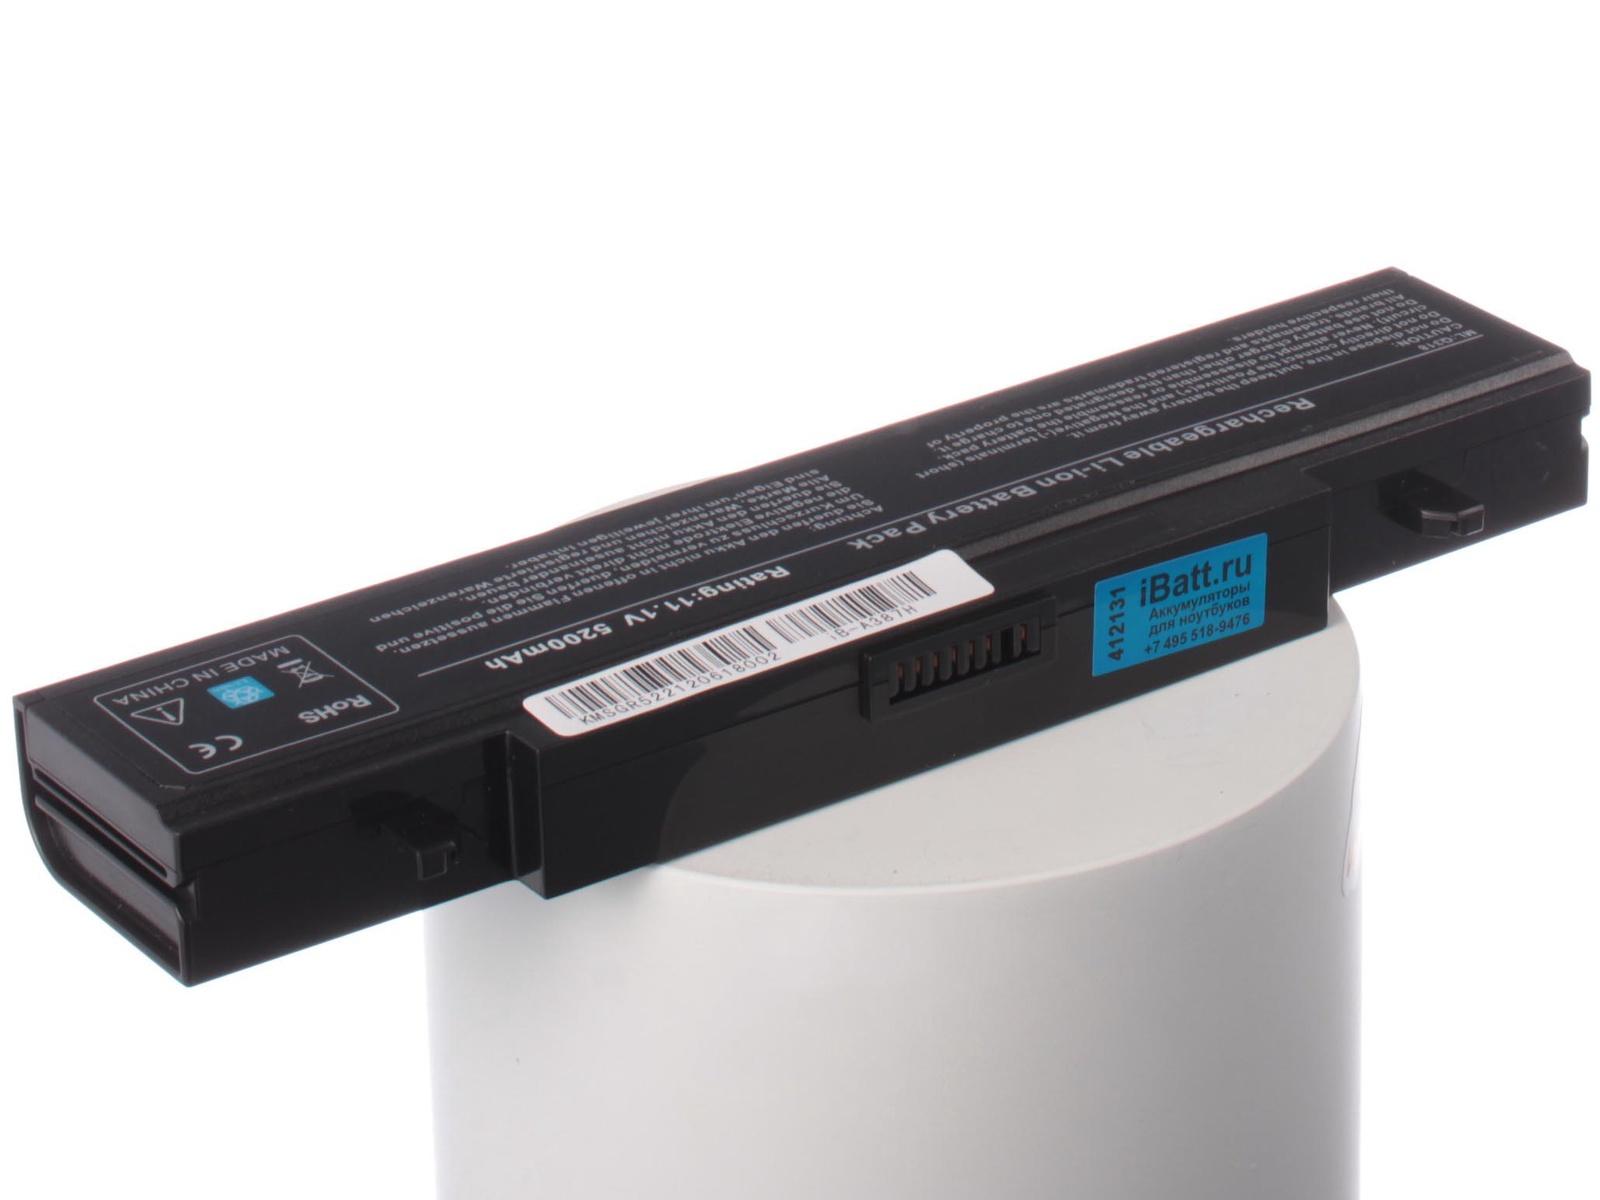 Аккумулятор для ноутбука iBatt для Samsung RF511-S0B, RF711-S02, RV515-A01, RV520-S02, RV520-S0L, 300E5A-S04, 300E5A-S05, 300E5C-S0V, 300E5V-A01, 300V5A-S0F, 305E5A-S08, 305V5A-S06, 350V5C-S1D, R430-JA02, R430-JS06, R463-DS02 аккумулятор для ноутбука anybatt для samsung 300v5a s05 300v5a s0j 300v5a s0s 300v5a s0t 300v5a s0v 305v5a s0b 310e5c a01 350e5c s0e 350e7c s0a 350v5c s0z 355v5c s0l ativ book 2 270e4e np r39 np r39 plus np r408